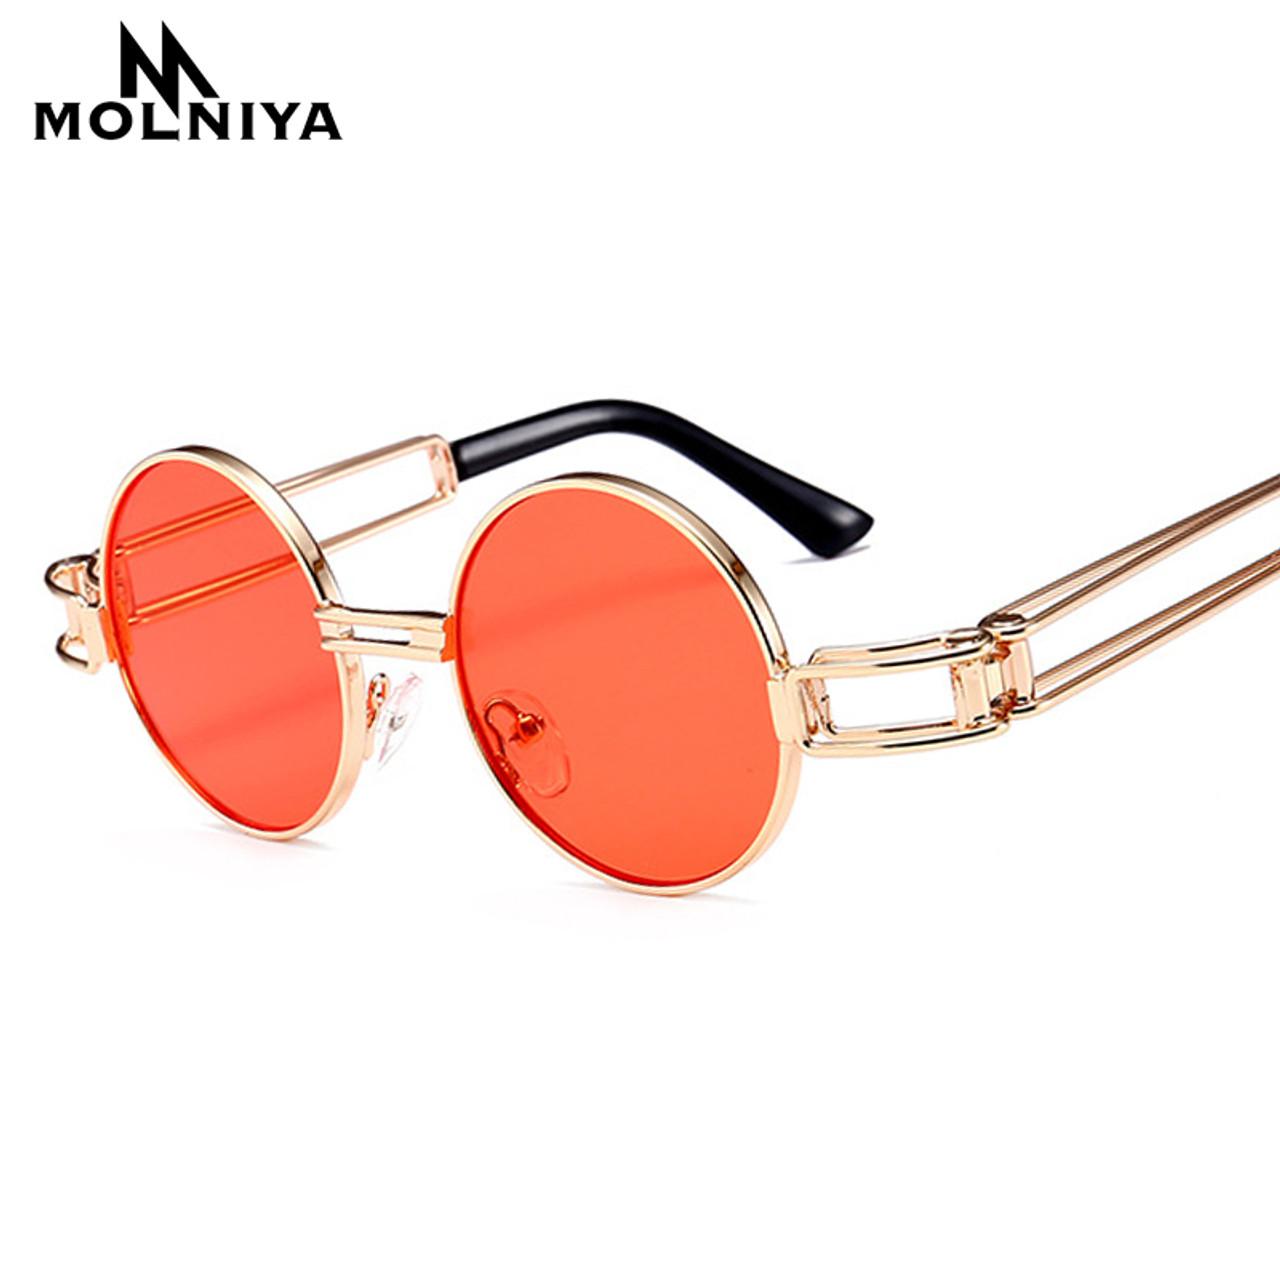 8415e5b921bb ... MOLNIYA New Small Round Sunglasses Men Retro Red Yellow 2019 Gold Frame  Steampunk Round Metal Sun ...